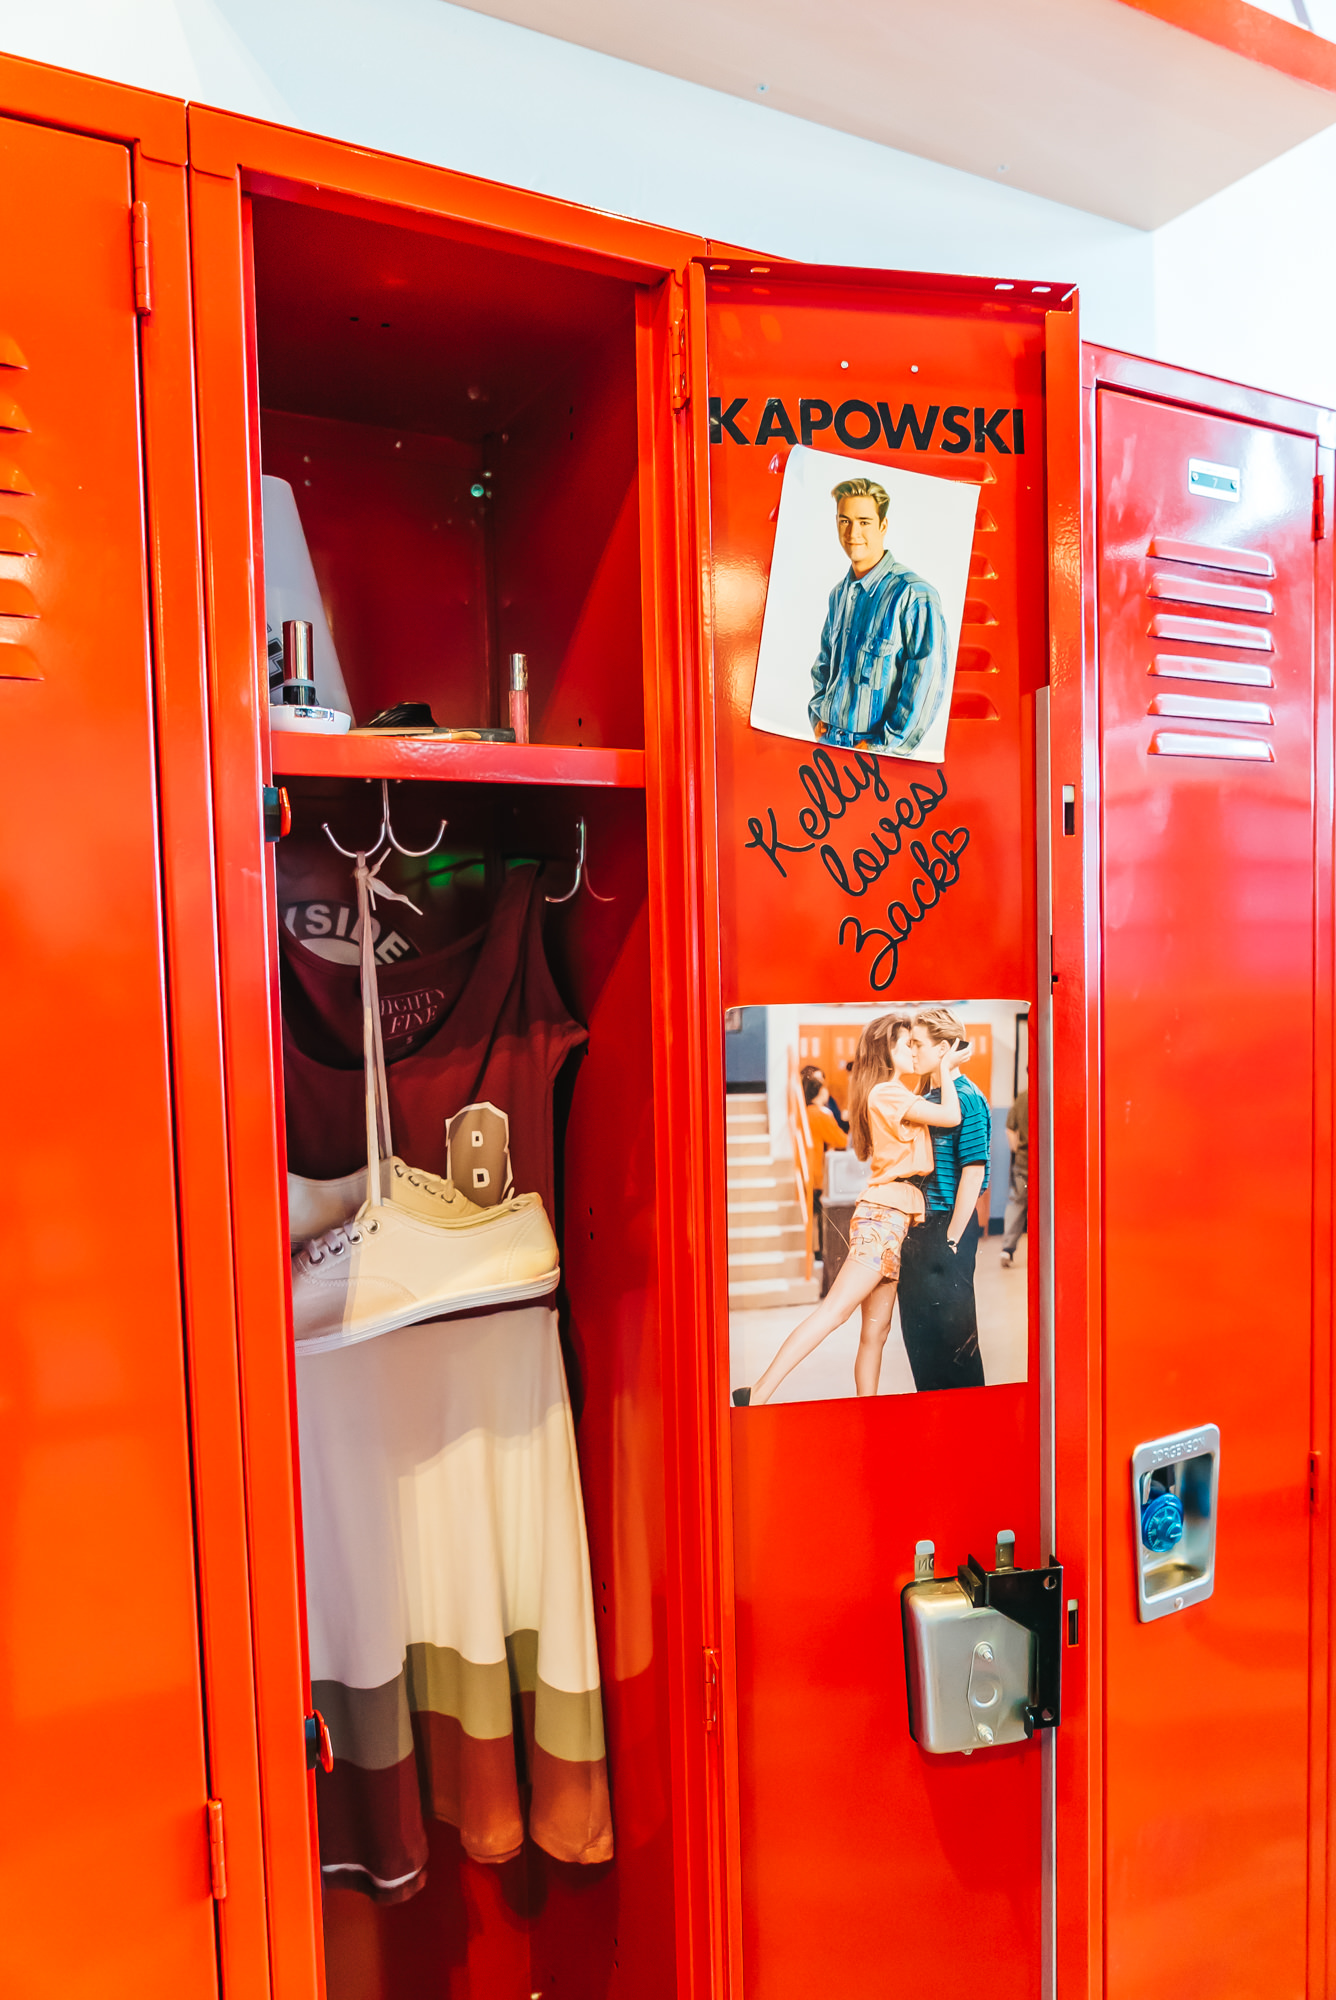 Kelly Kapowski's Locker